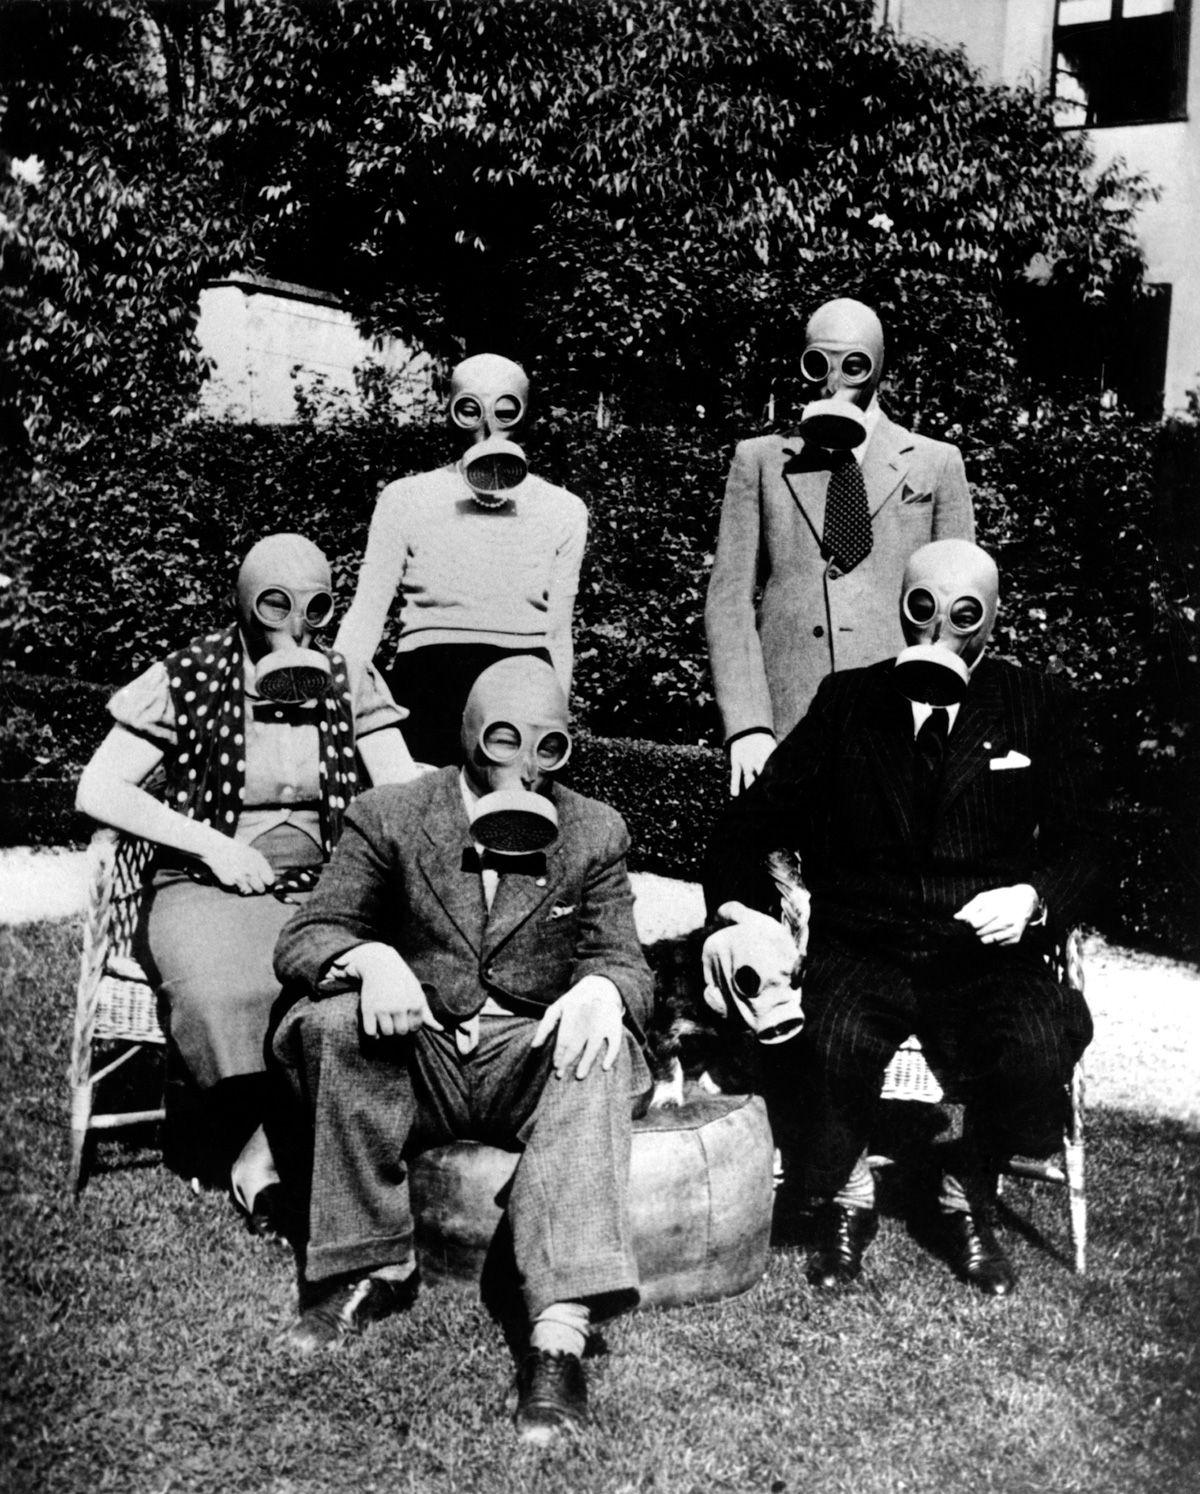 Dogs wore gas masks against threat of chemical warfare | Hundar ...